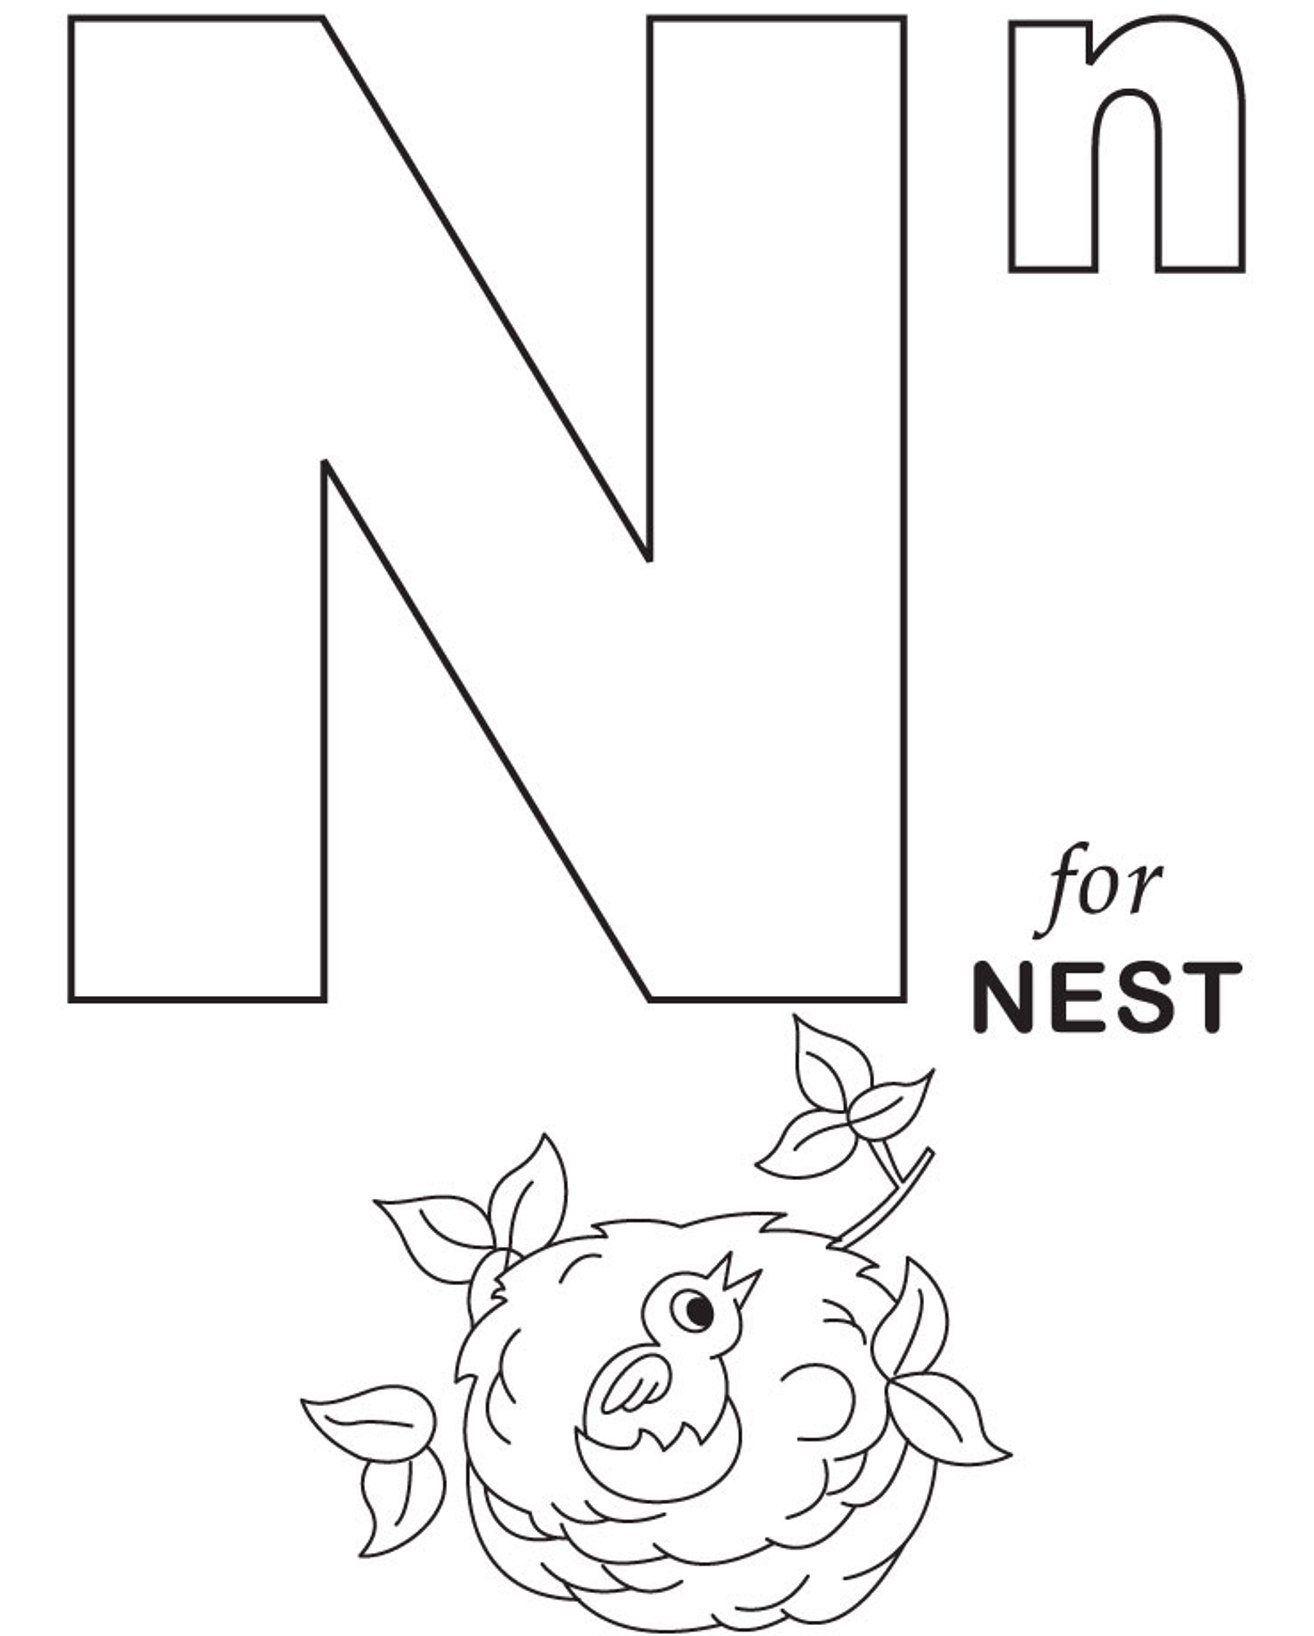 Letter N Coloring Pages Paginas Para Colorir Alfabeto Em Ingles Alfabeto Para Impressao